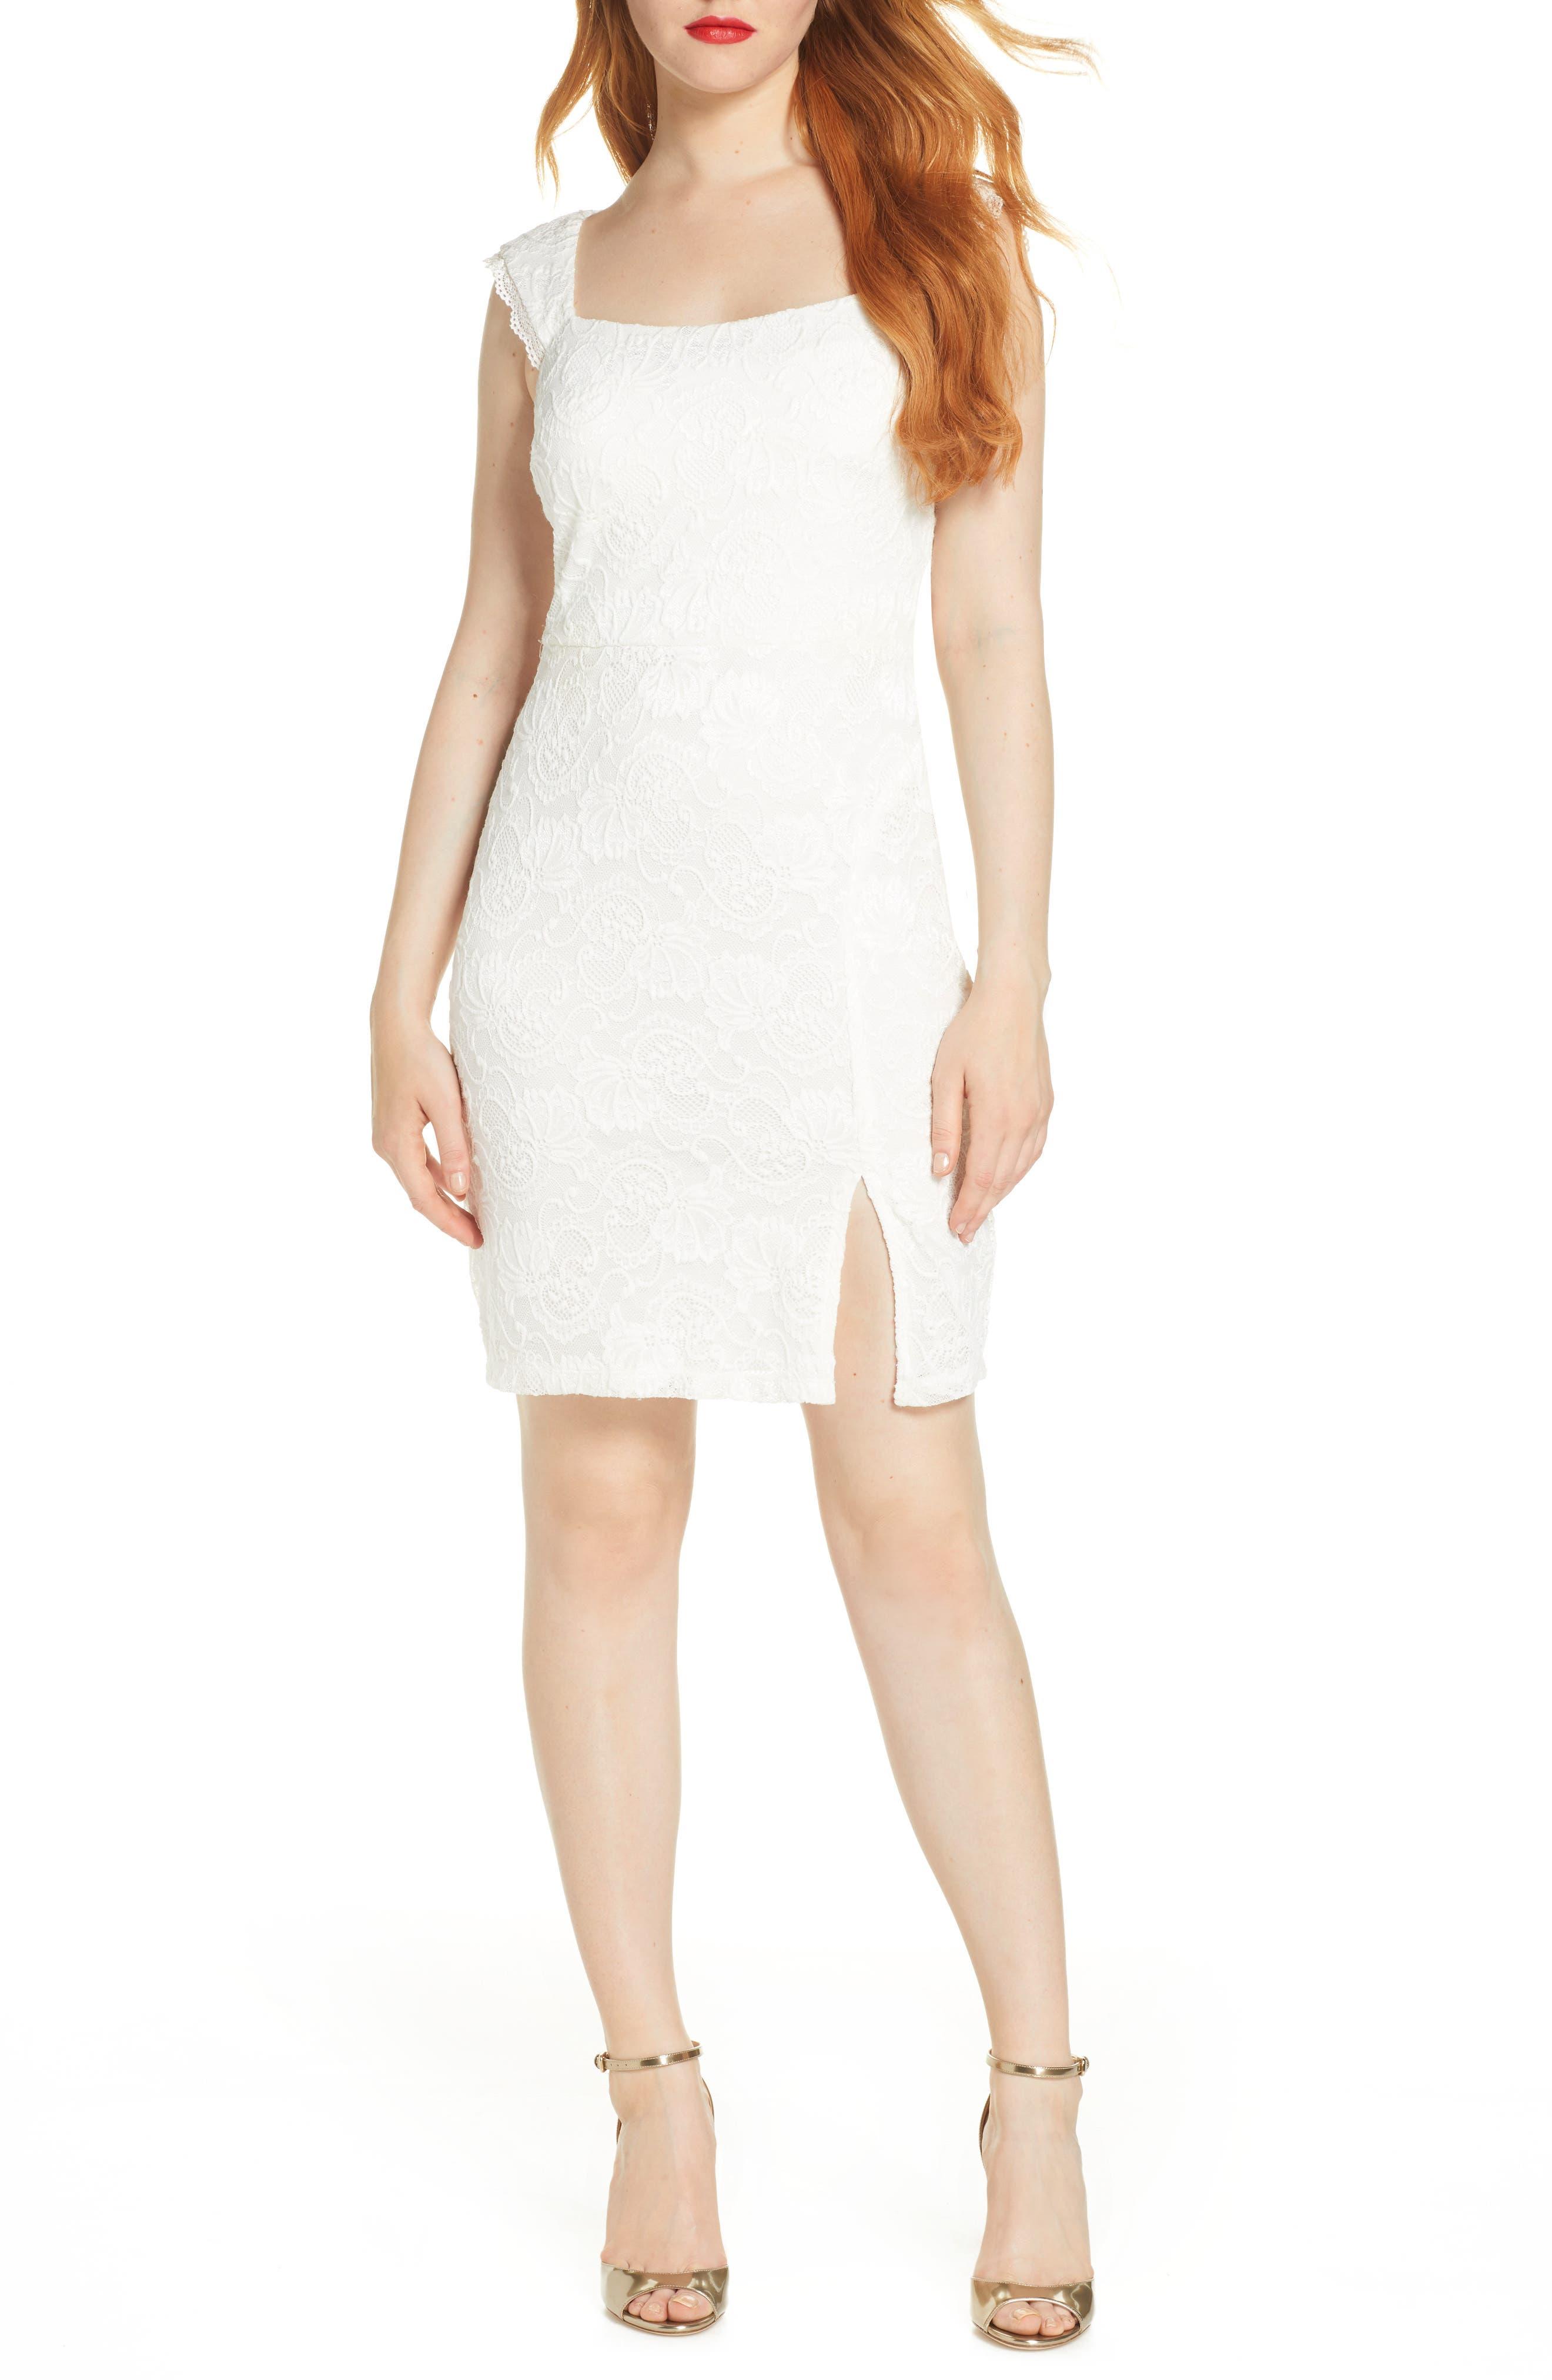 Sequin Hearts Lace Sheath Dress, White